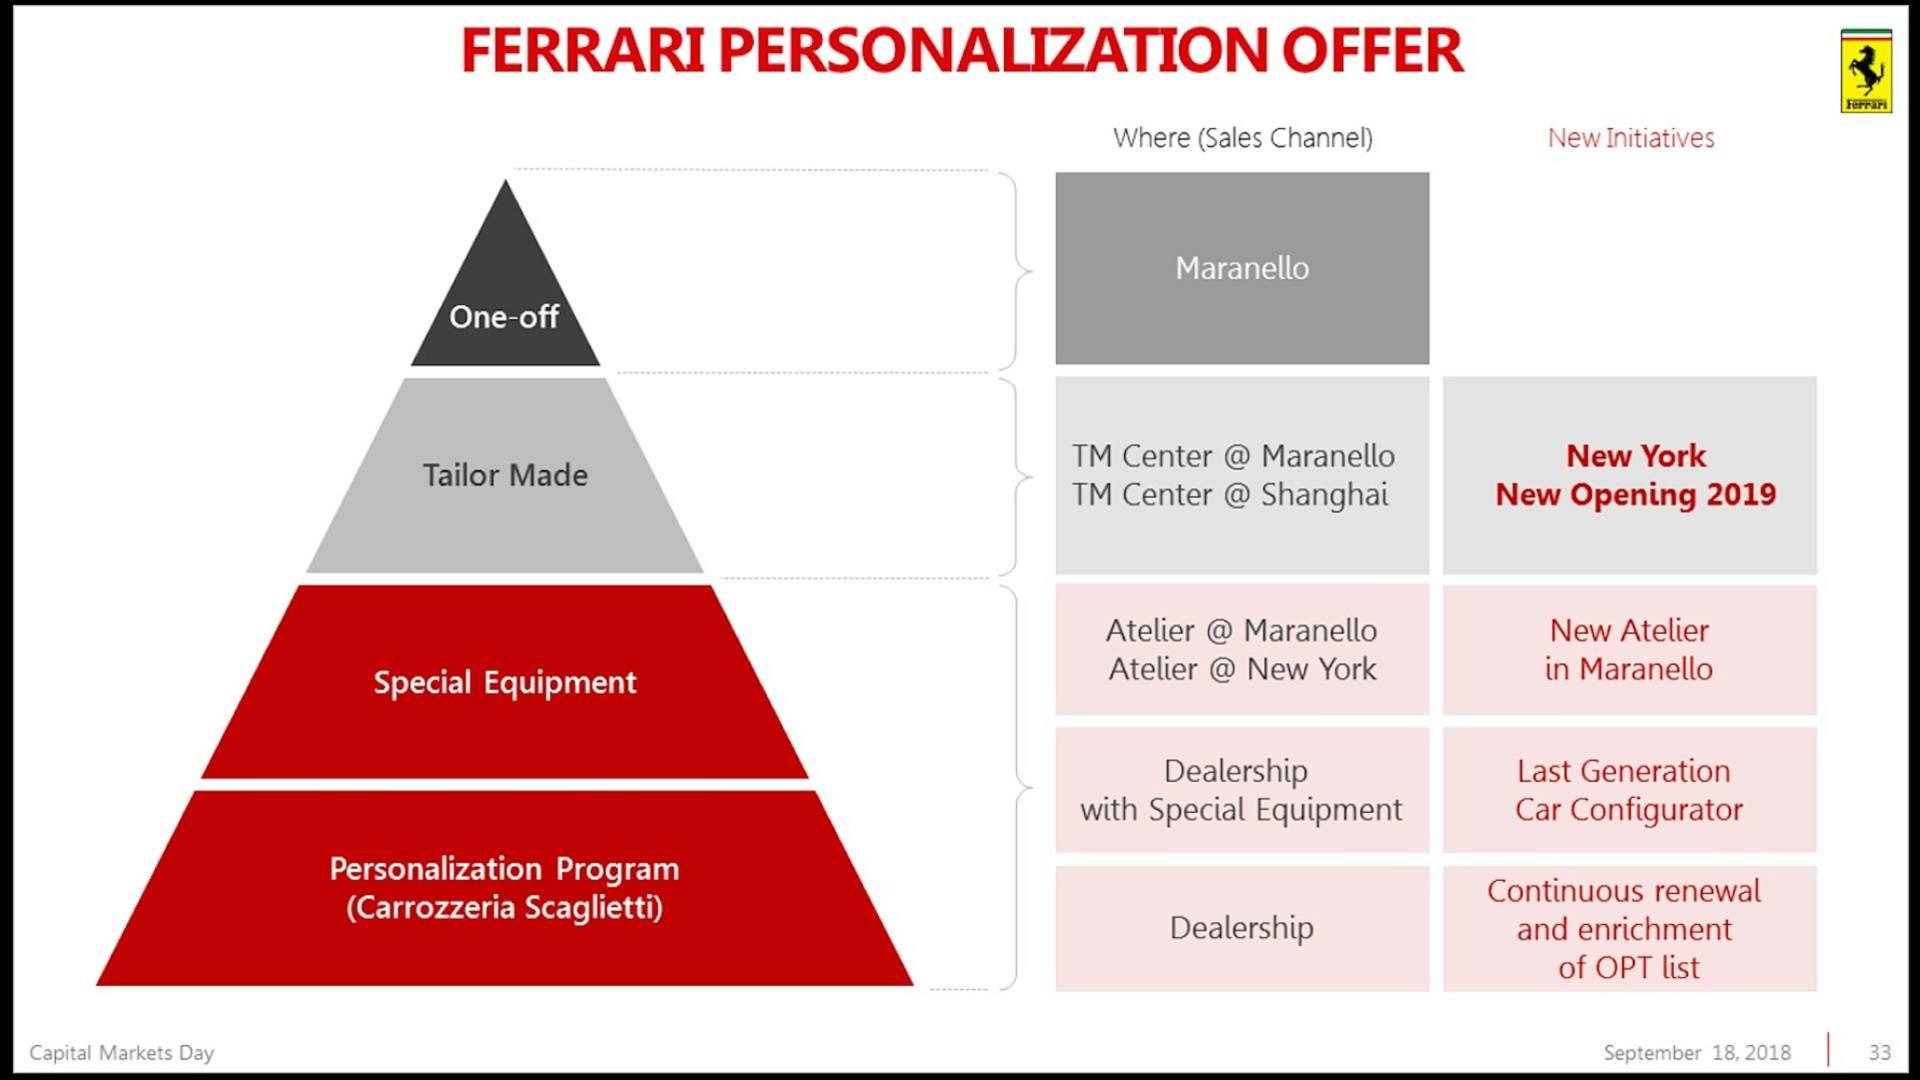 Piano Industriale Ferrari 2018-2022 (30)